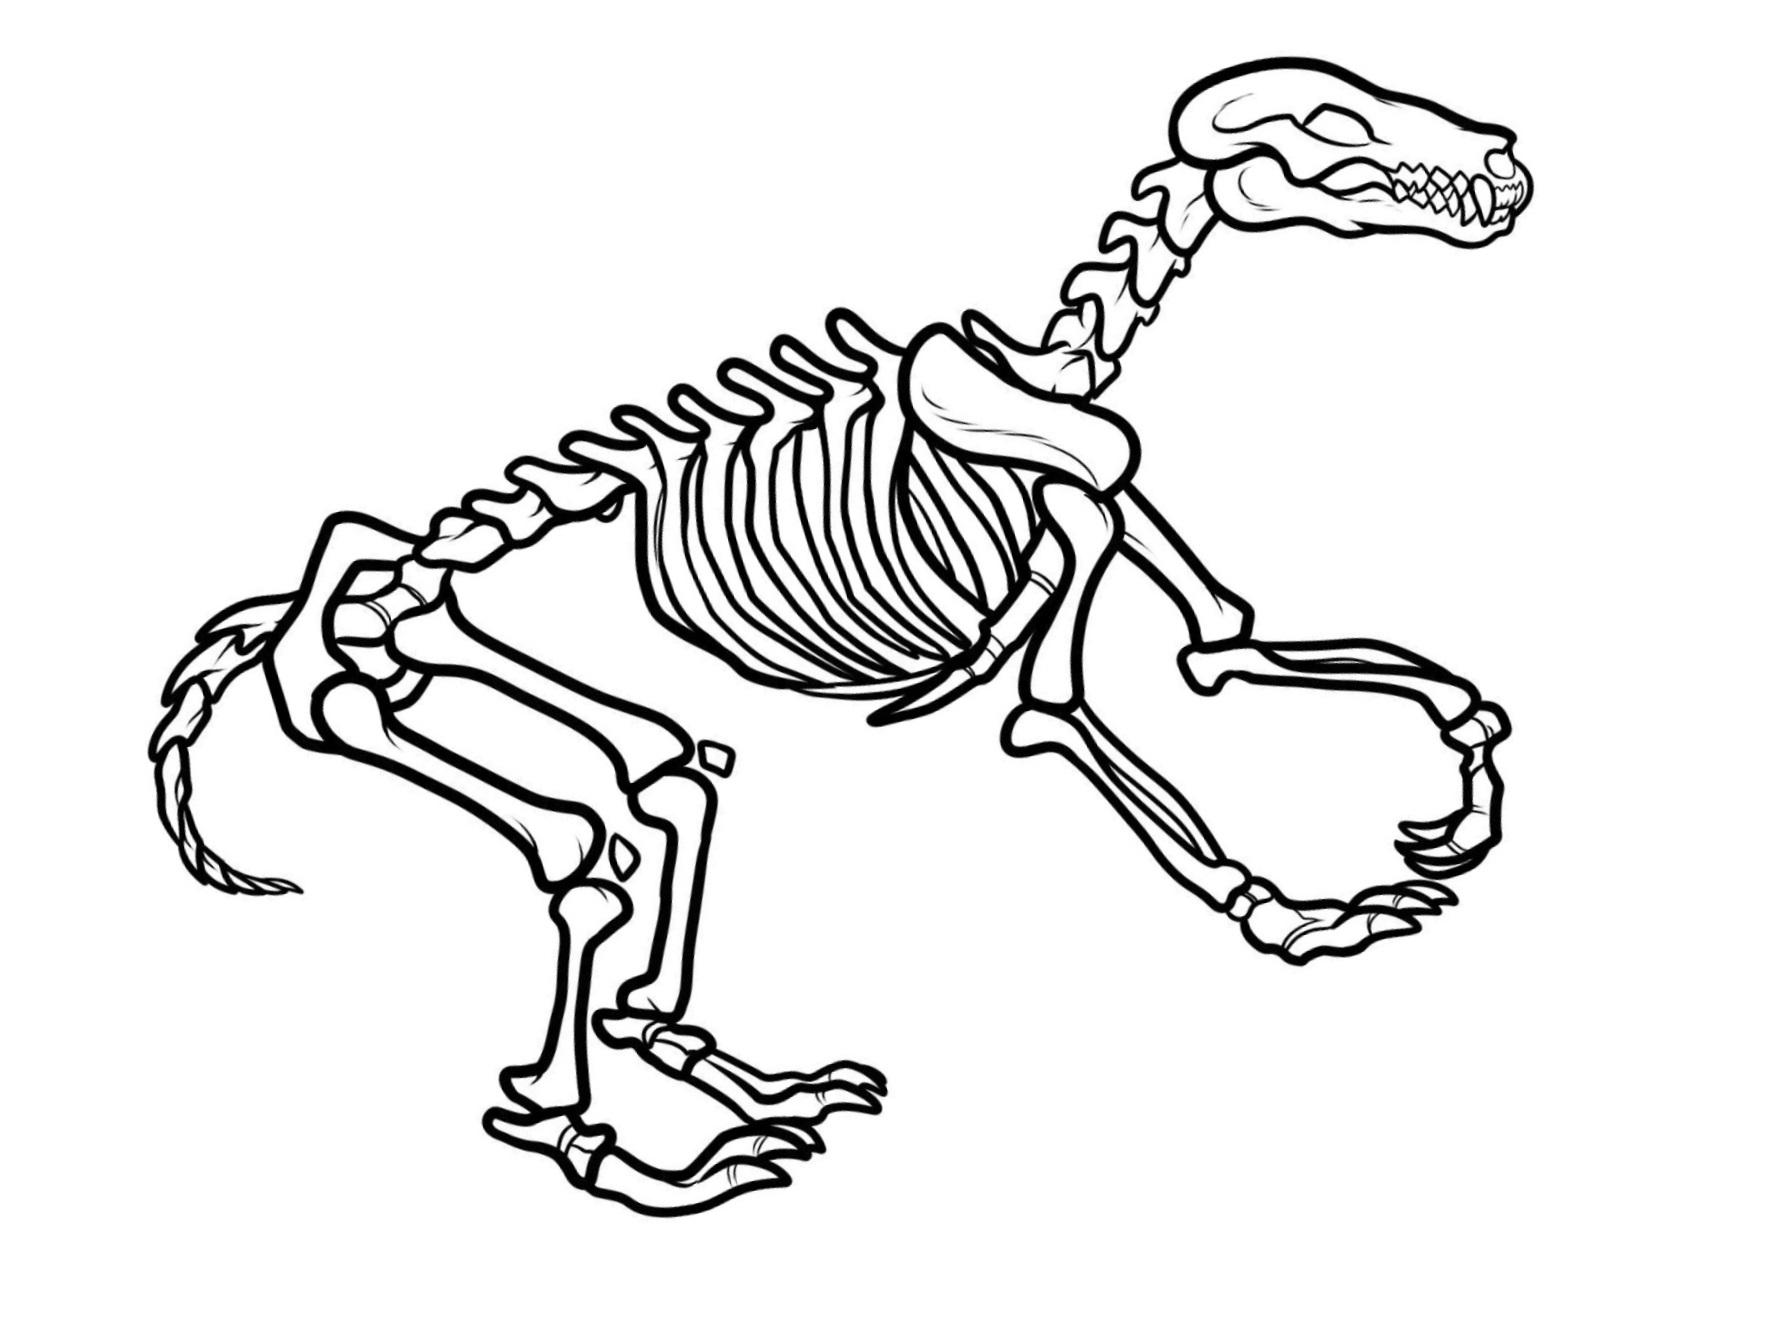 Dinosaur bones template free download best dinosaur for Printable dinosaur skeleton template